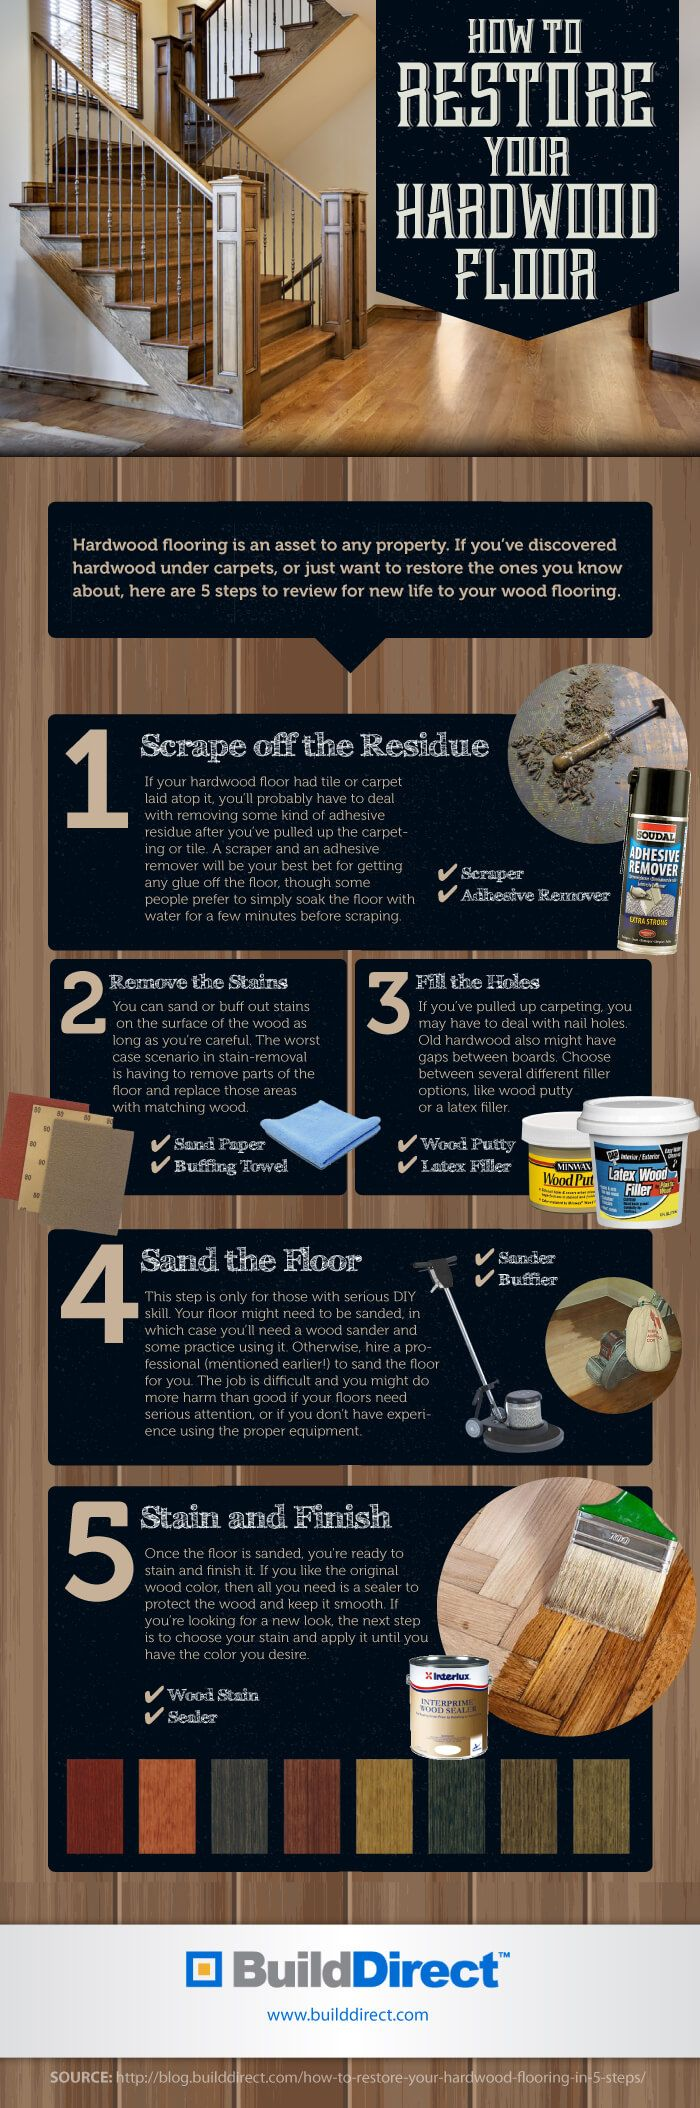 How To Restore Your Hardwood Floor: An Infographic